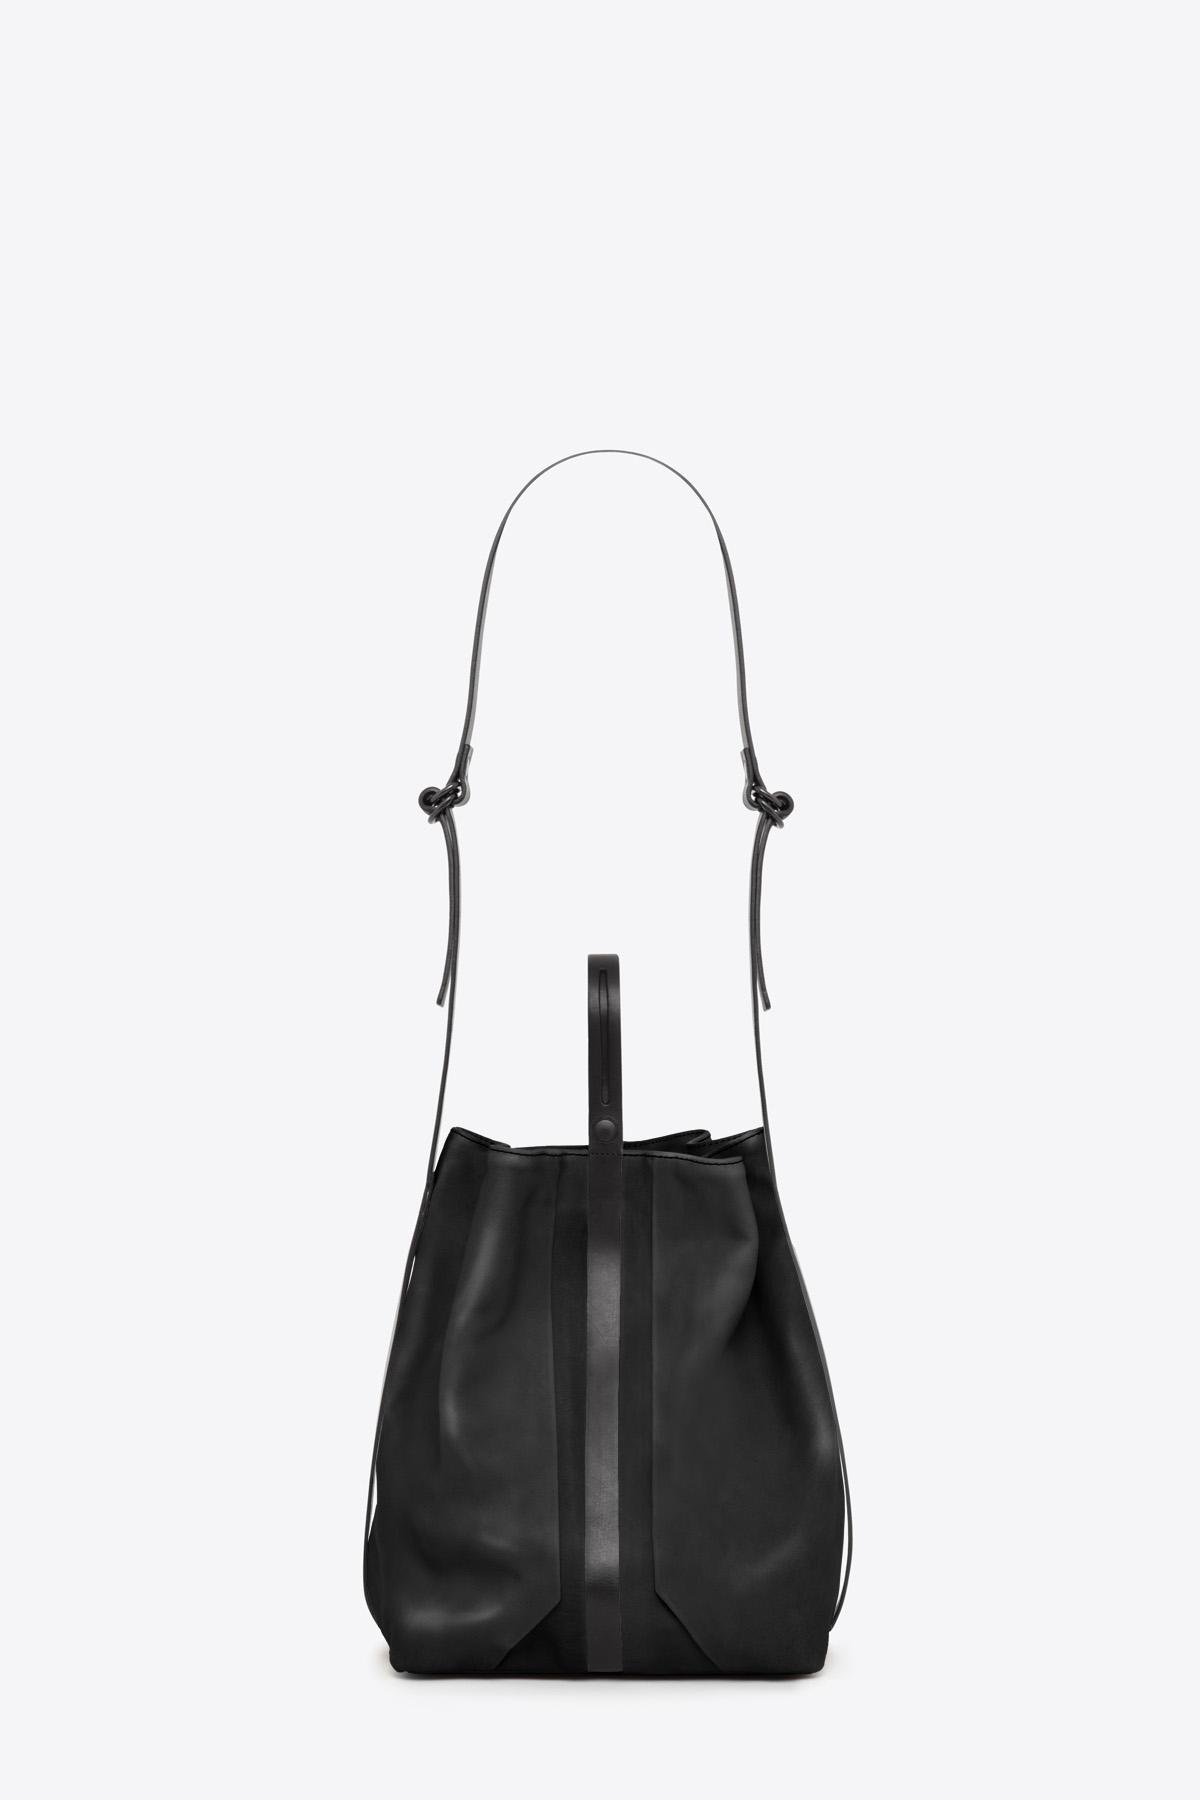 dclr010-bucketbag-a1-black-back